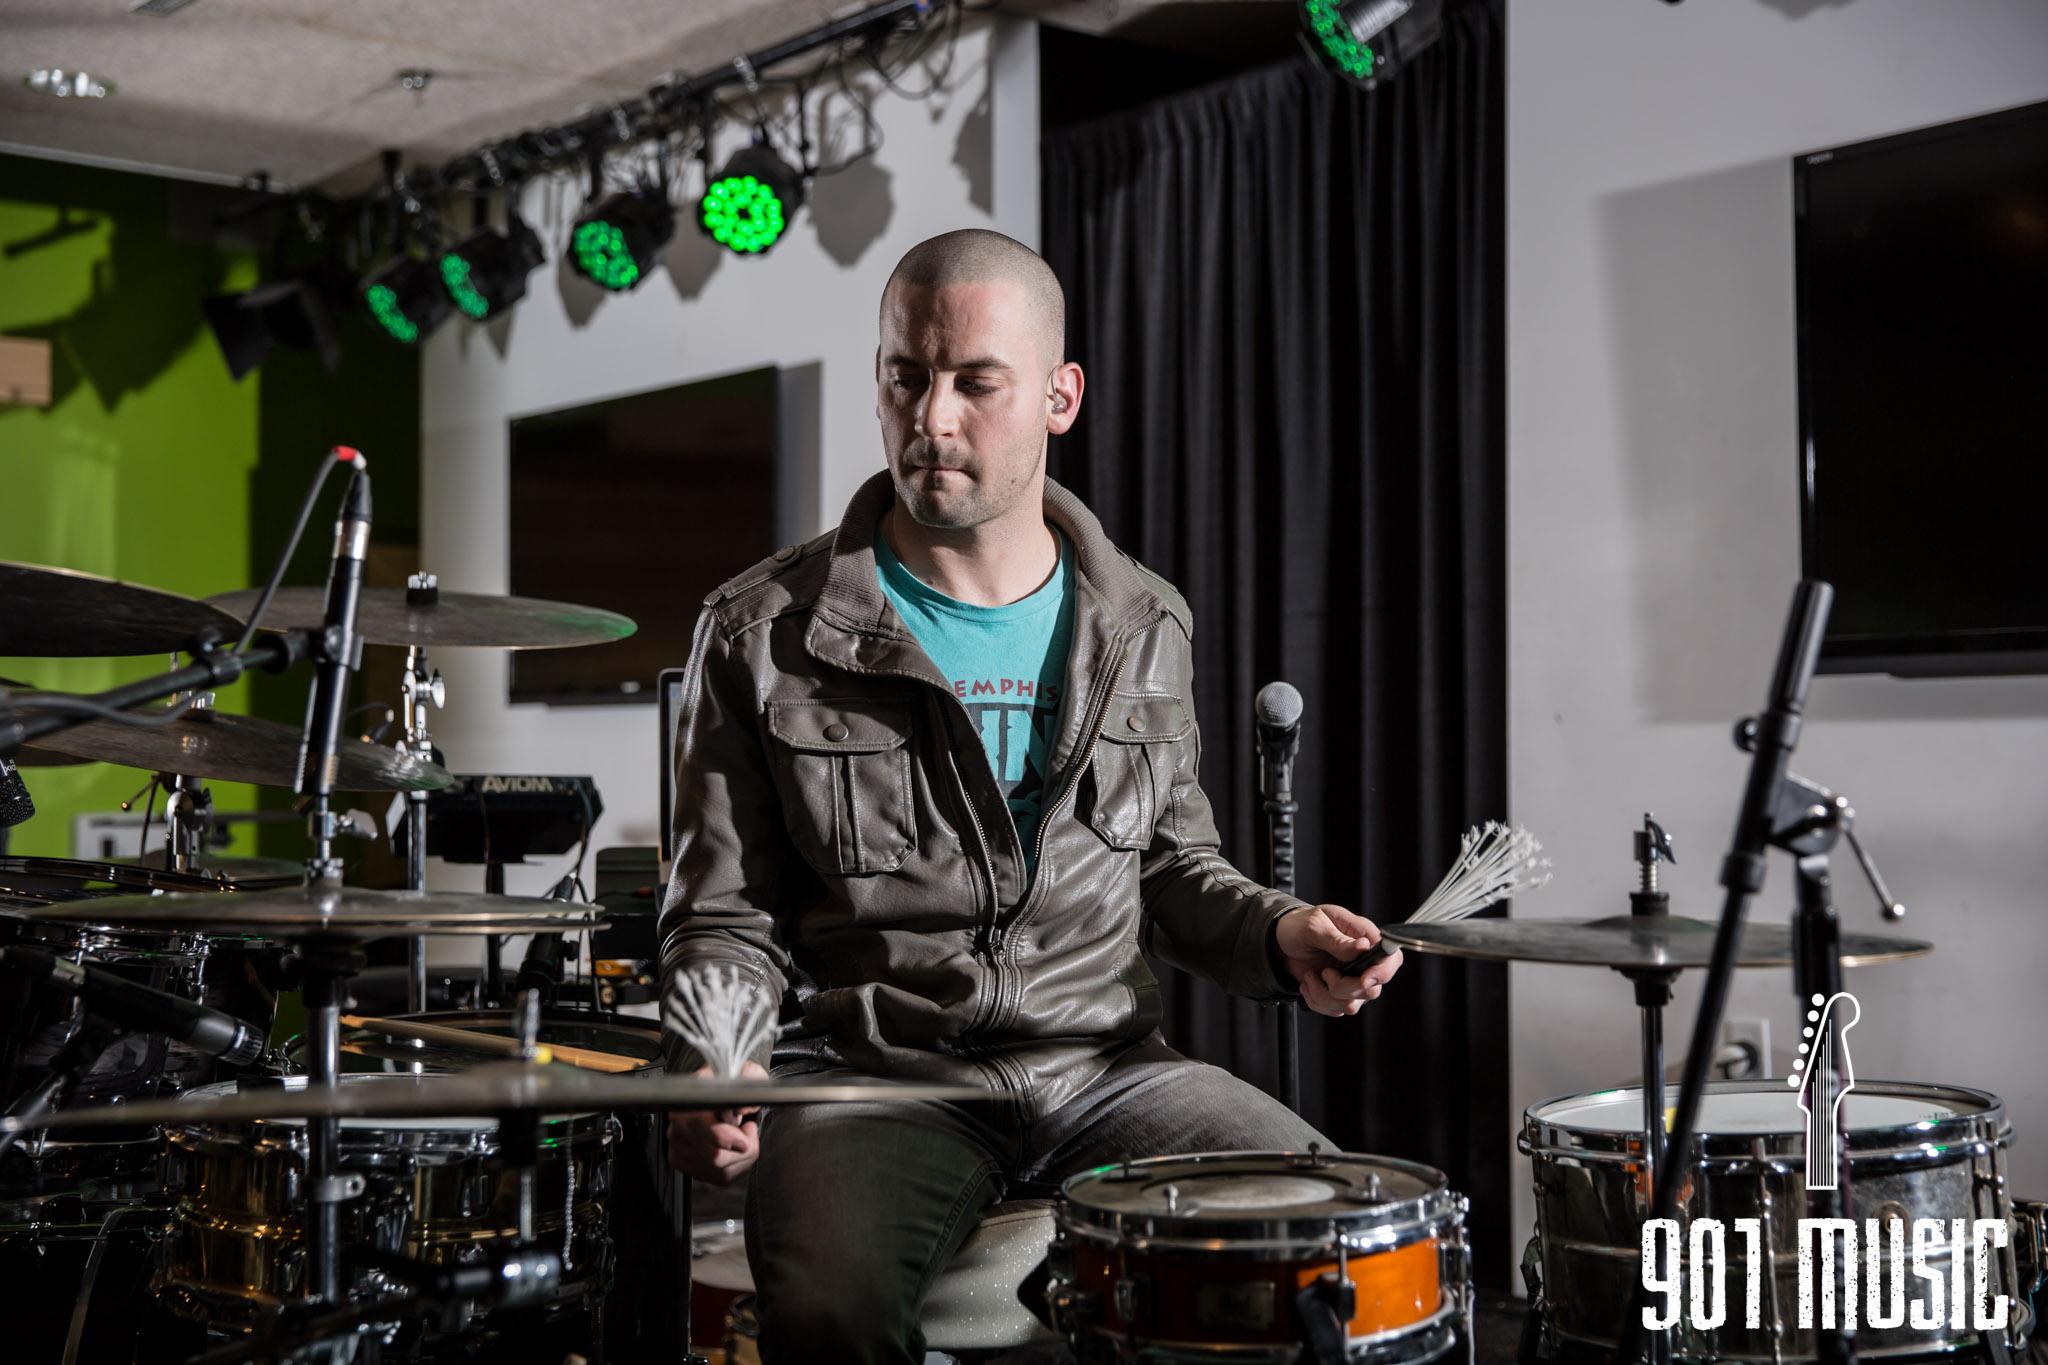 na-01222016-Visible Drum Show-23.jpg